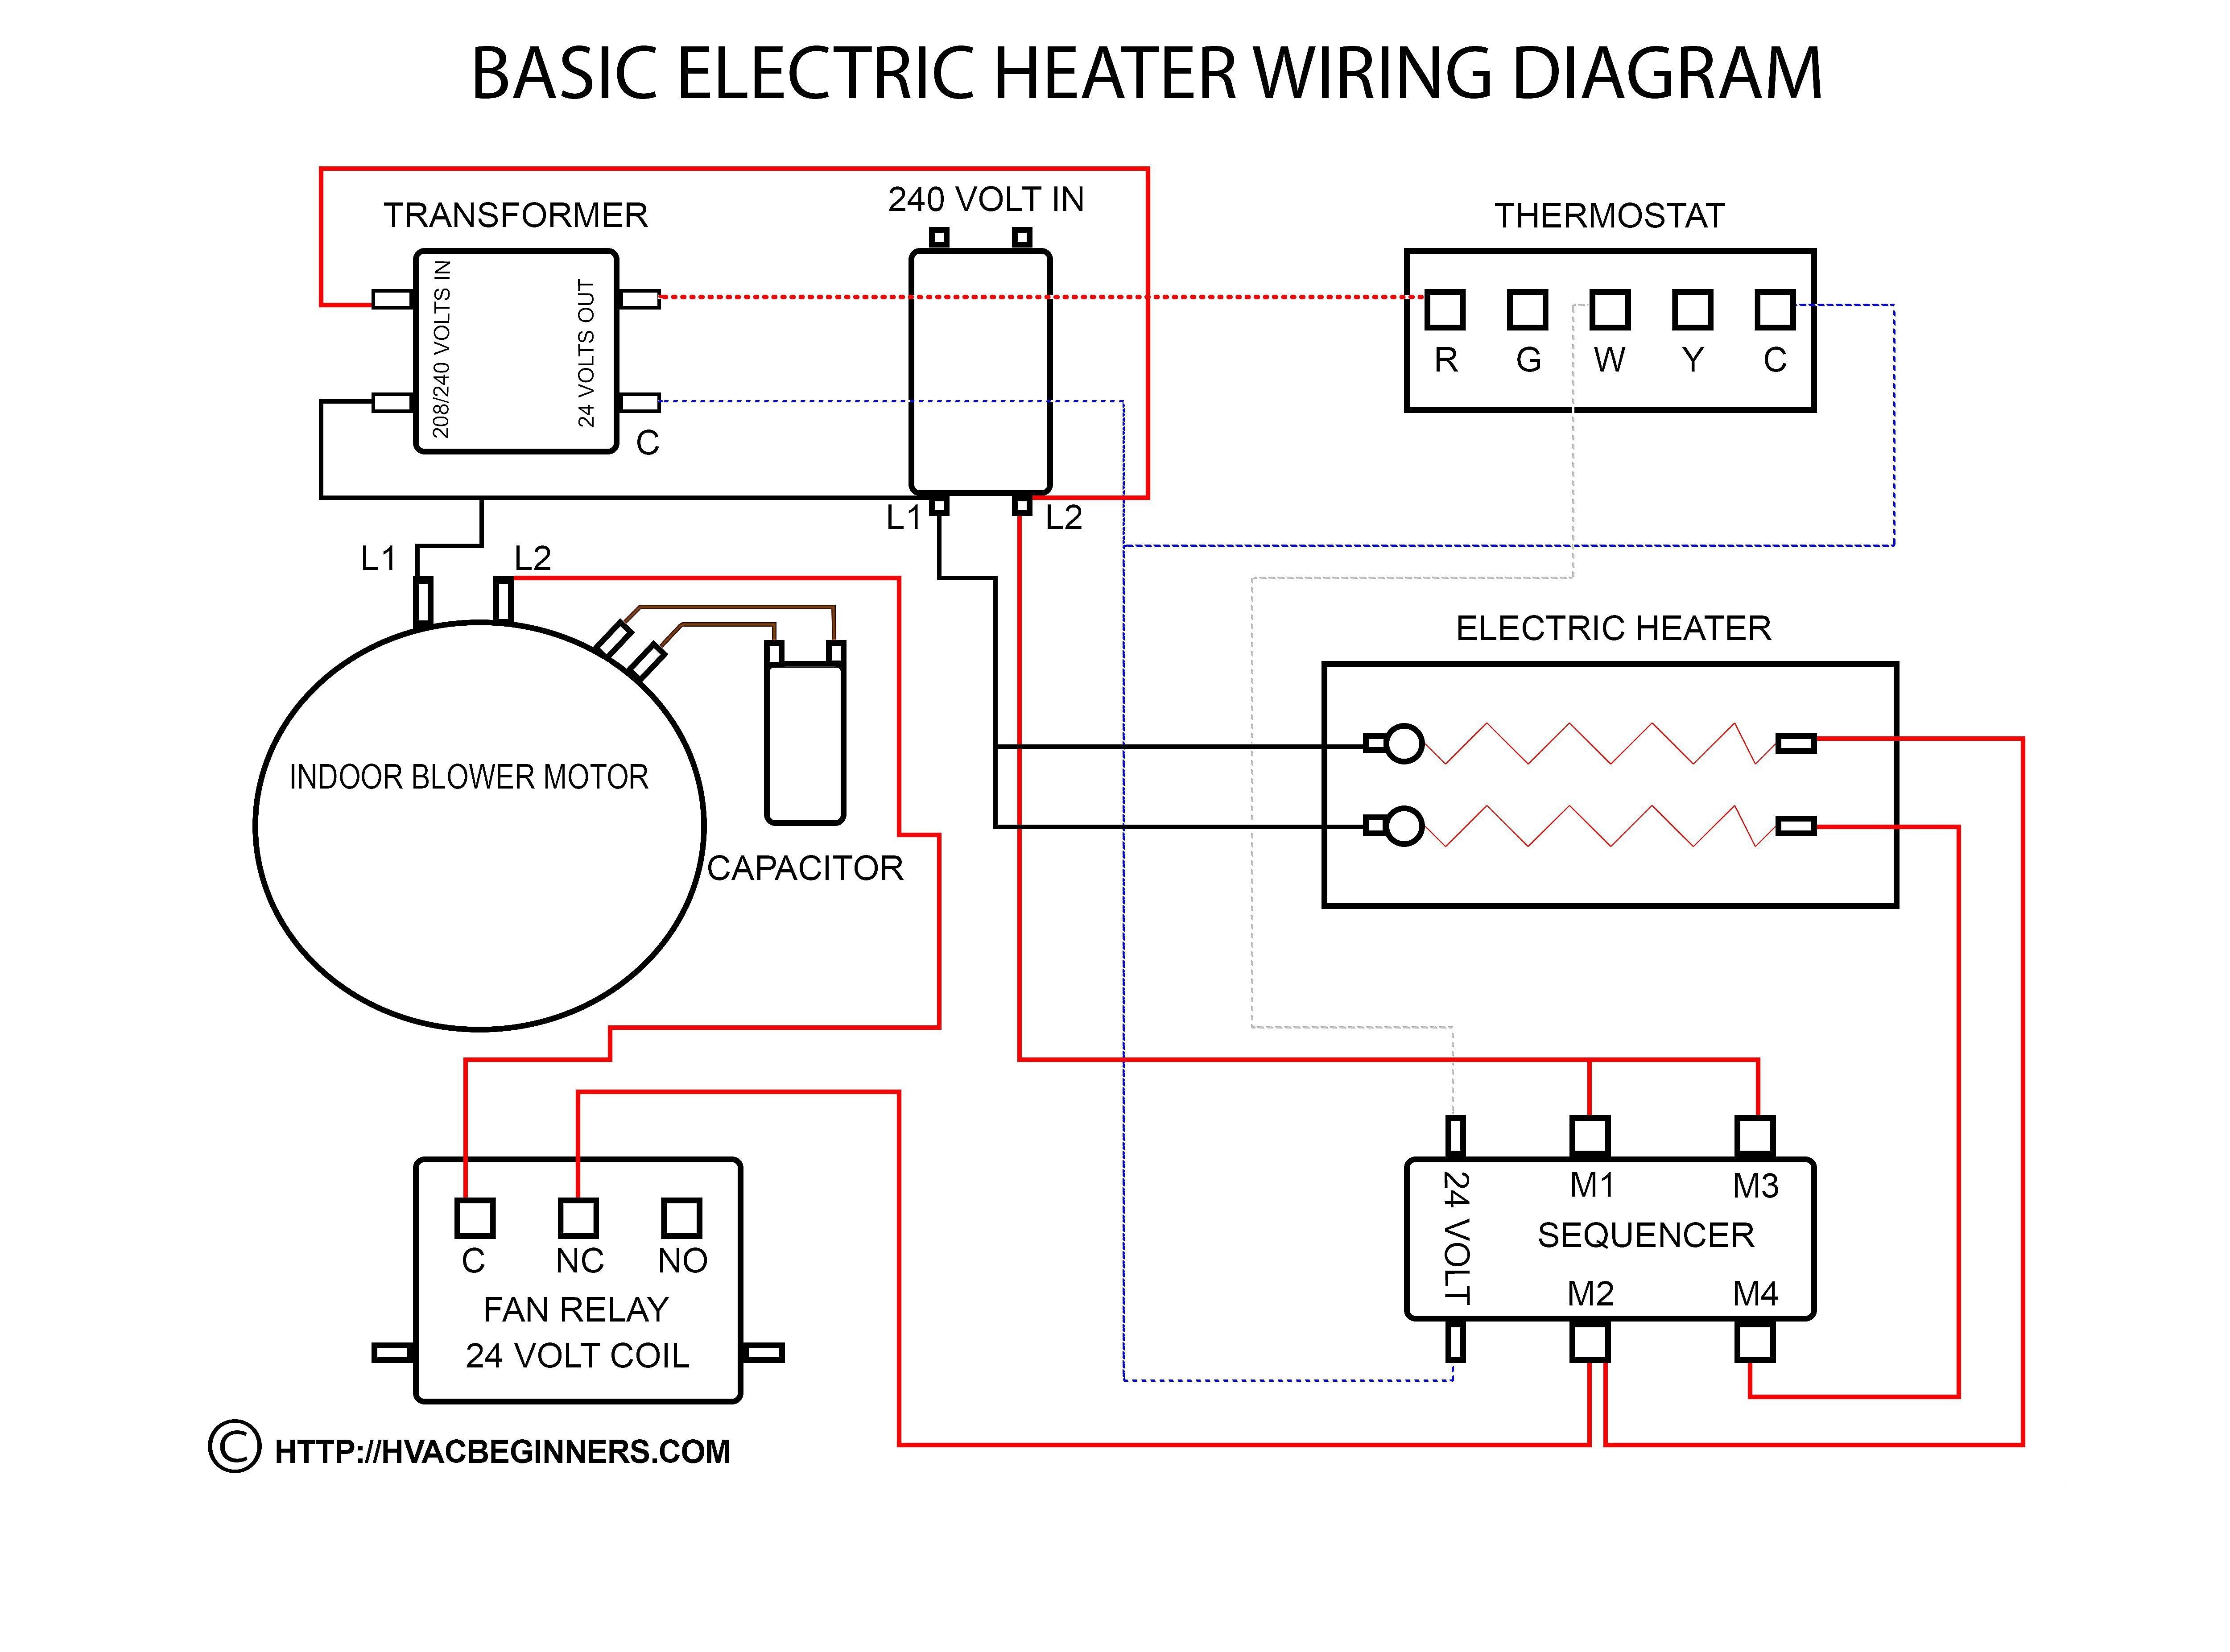 Wiring Diagram for S Plan Simple Wiring Diagram for Trailer Valid Http Wikidiyfaqorguk 0 0d